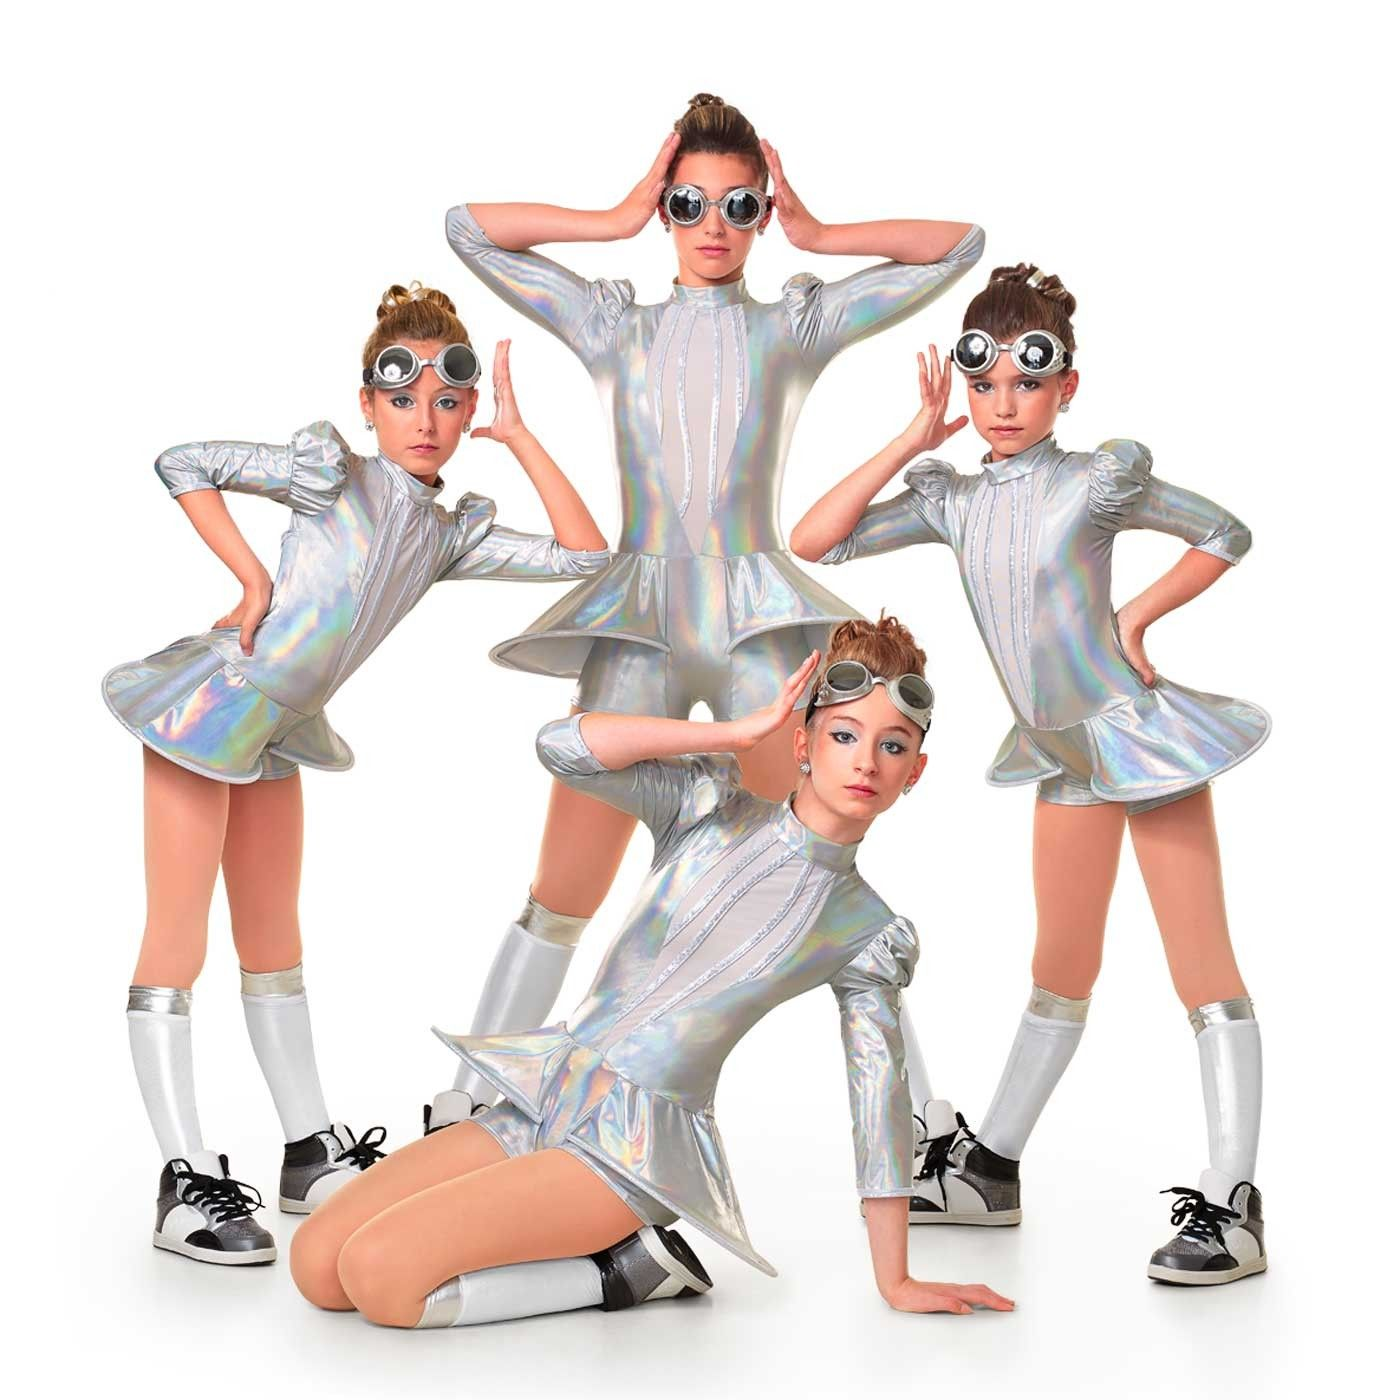 Metallic Machine Jazz costumes, Futuristic costume, Hip